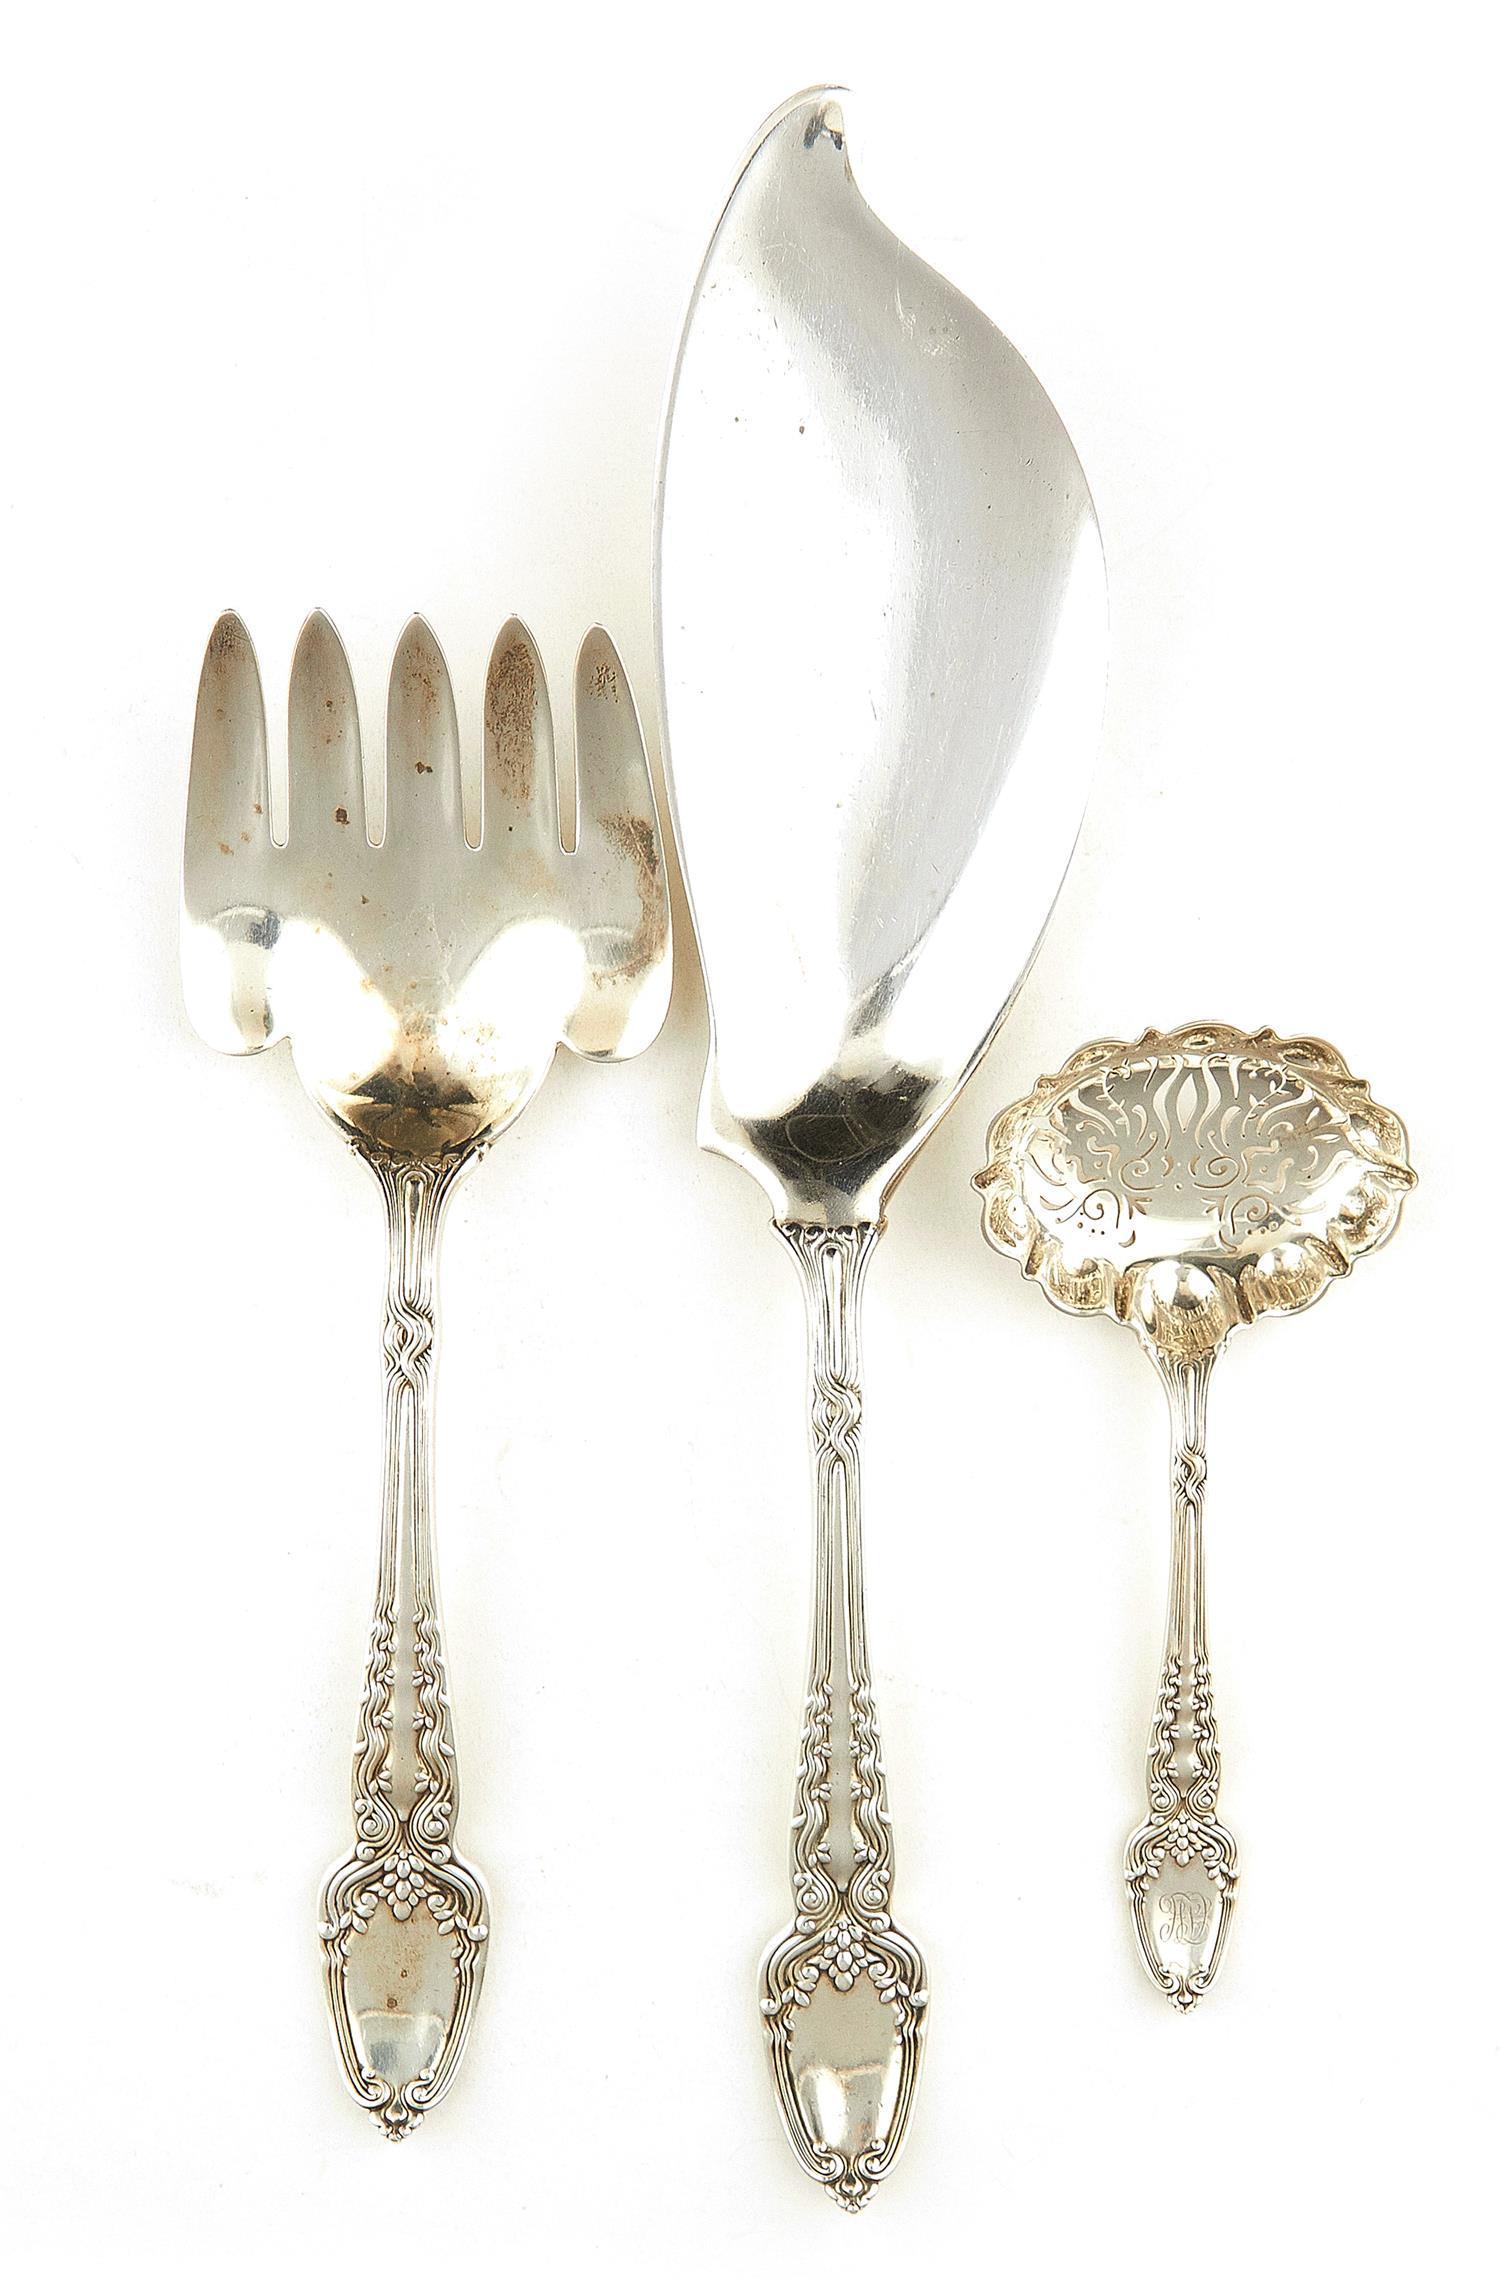 American silver flatware servers, Tiffany & Co (3pcs)